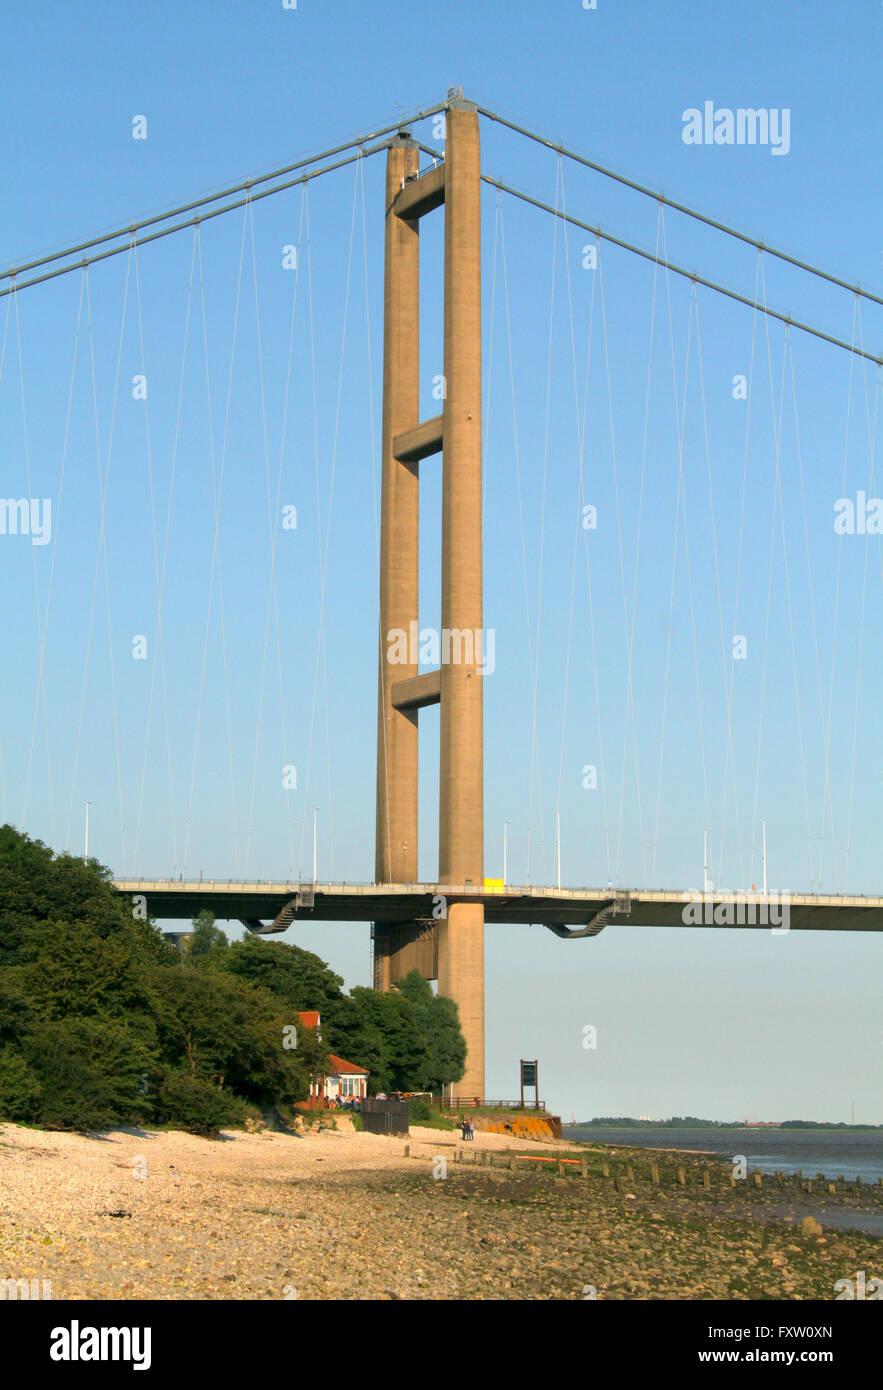 HUMBER BRIDGE NORTH BANK SUPPORT TOWERS HESSLE HULL ENGLAND 30 June 2014 - Stock Image